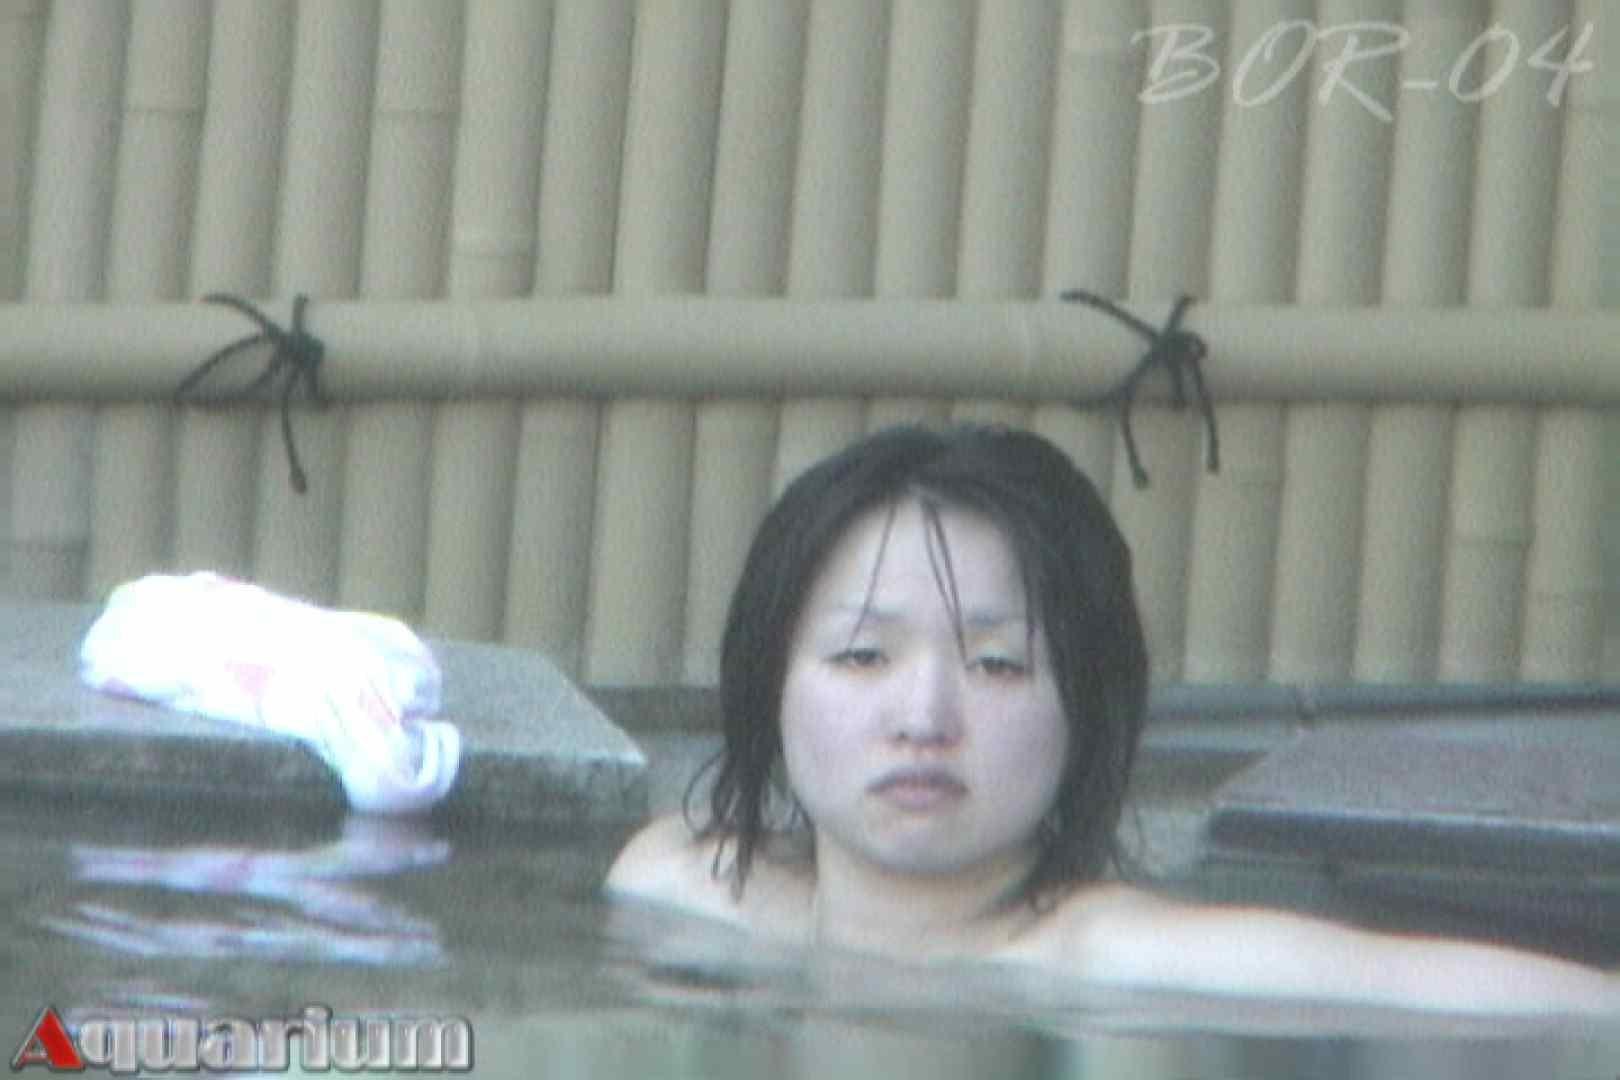 Aquaな露天風呂Vol.513 露天風呂突入 盗み撮り動画キャプチャ 101pic 26